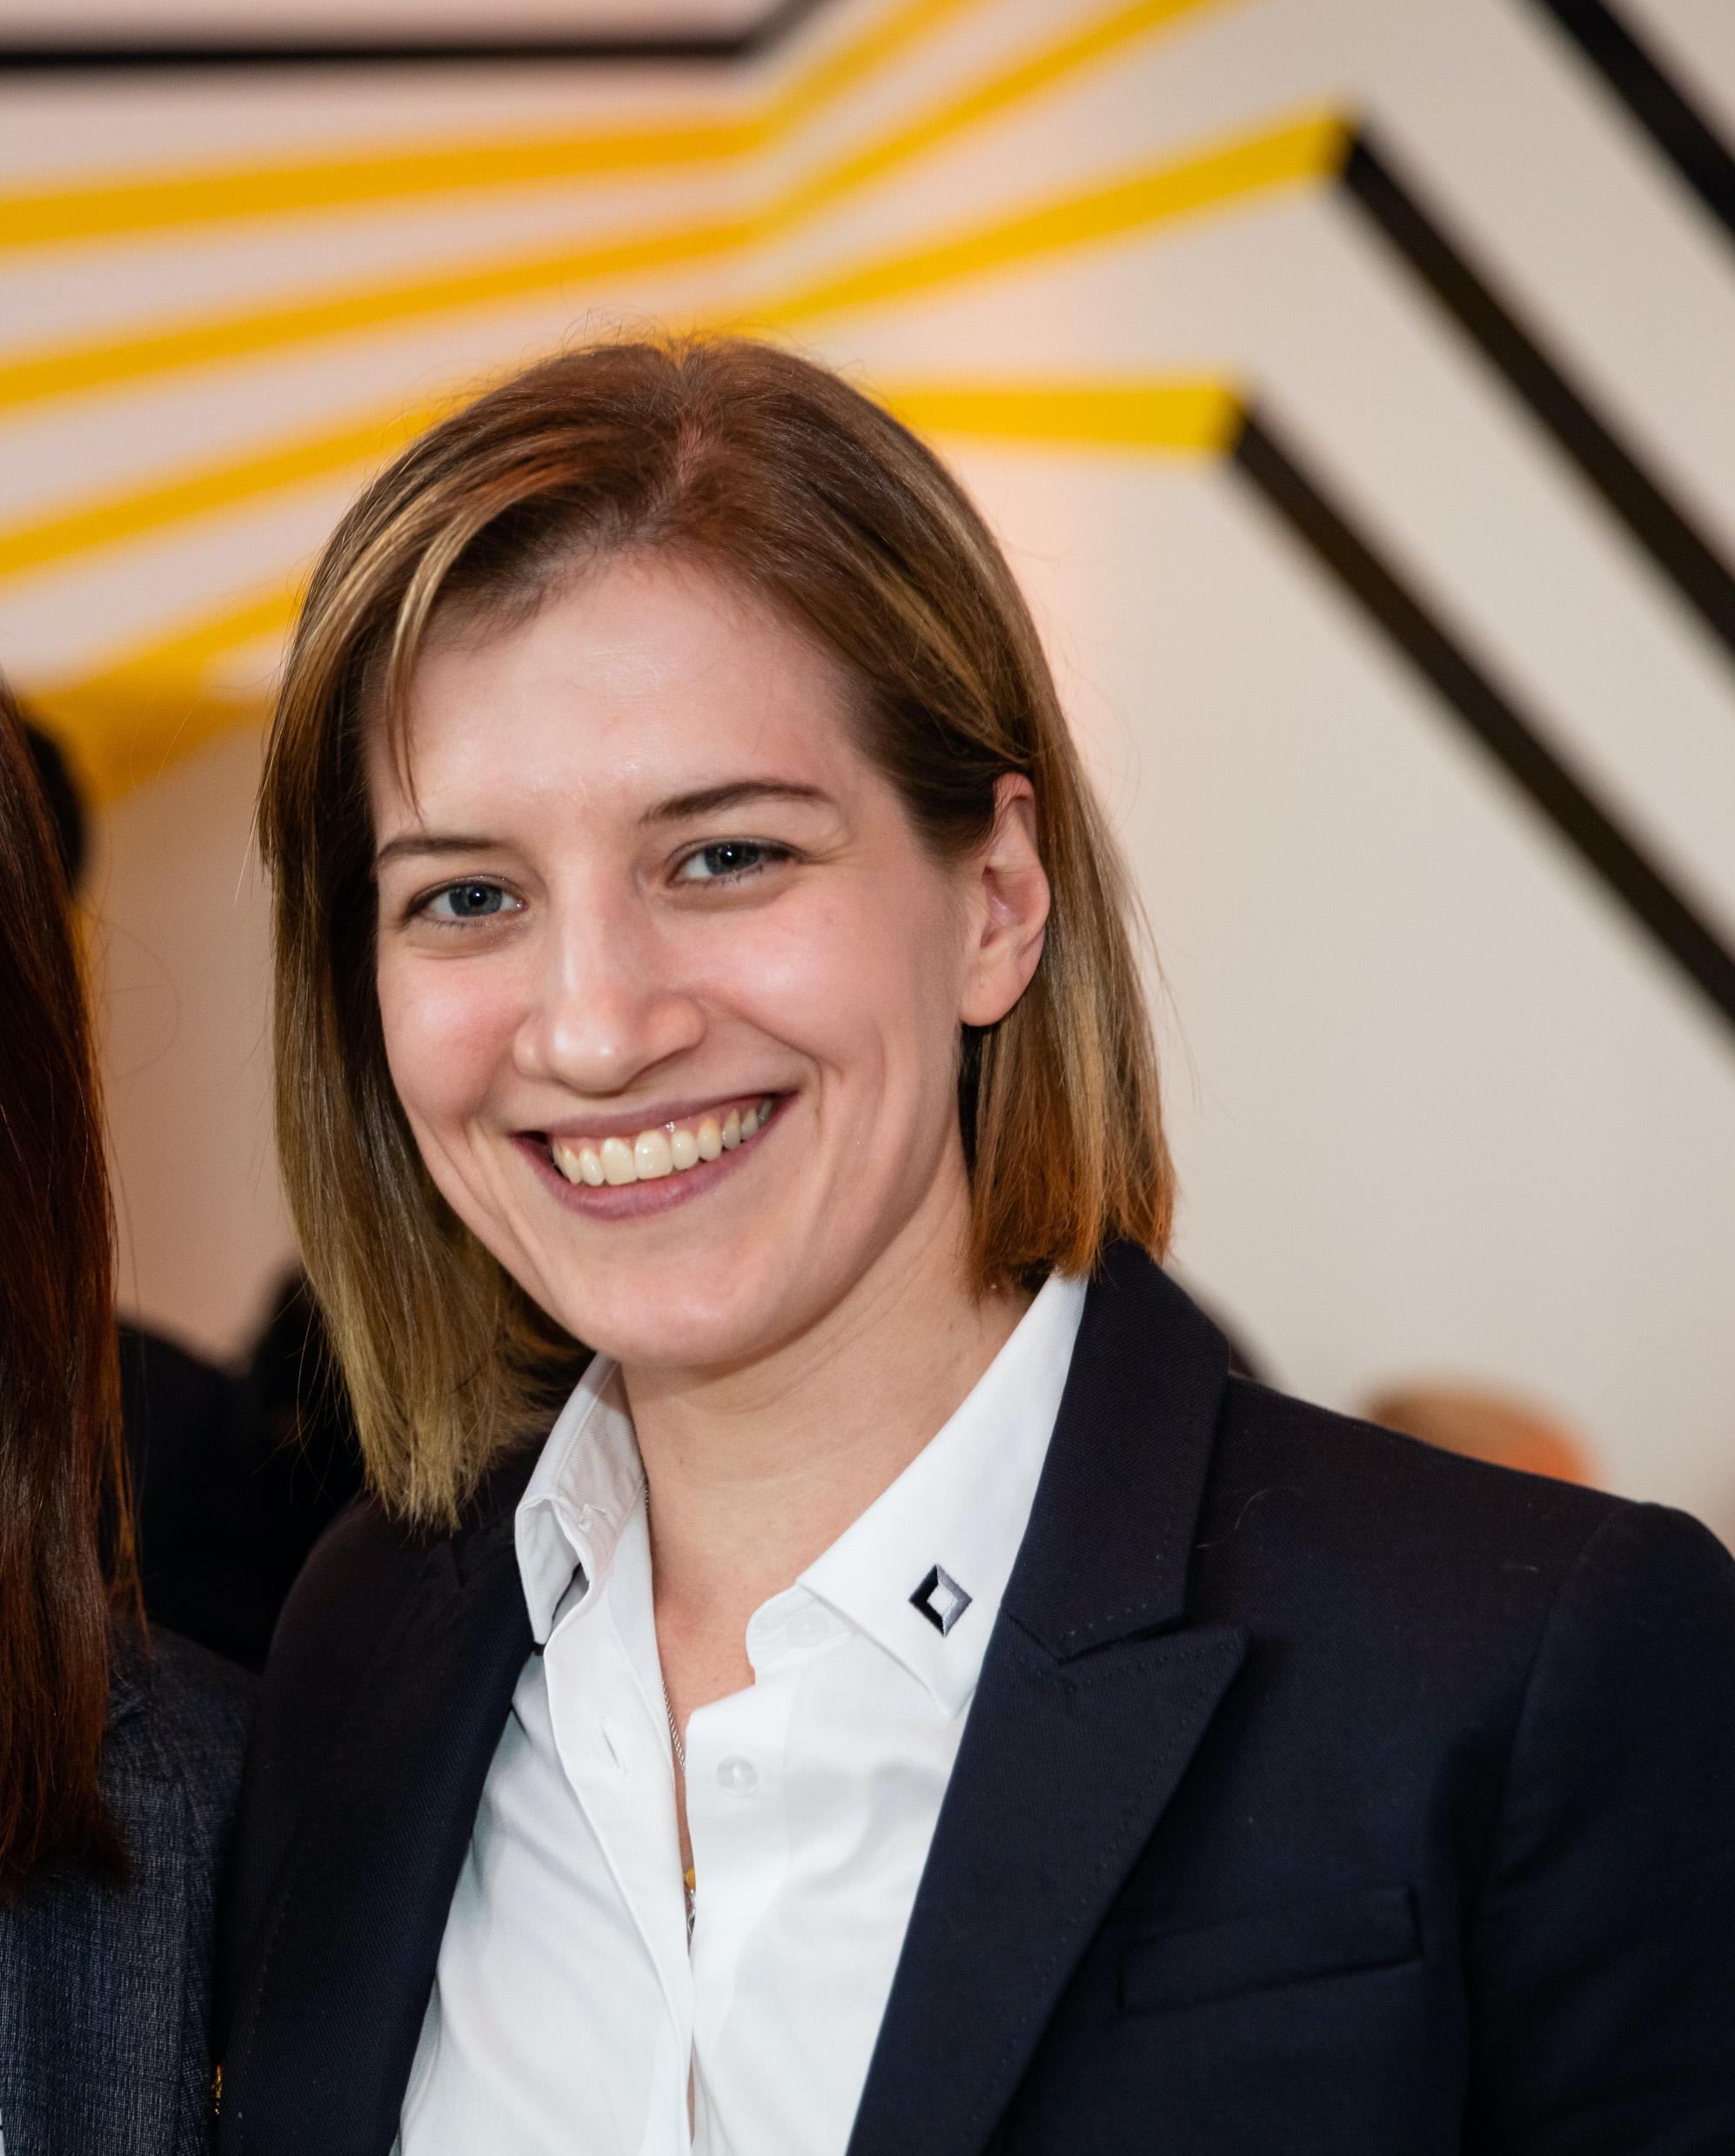 Irina Bytchkova - Business Development Manager